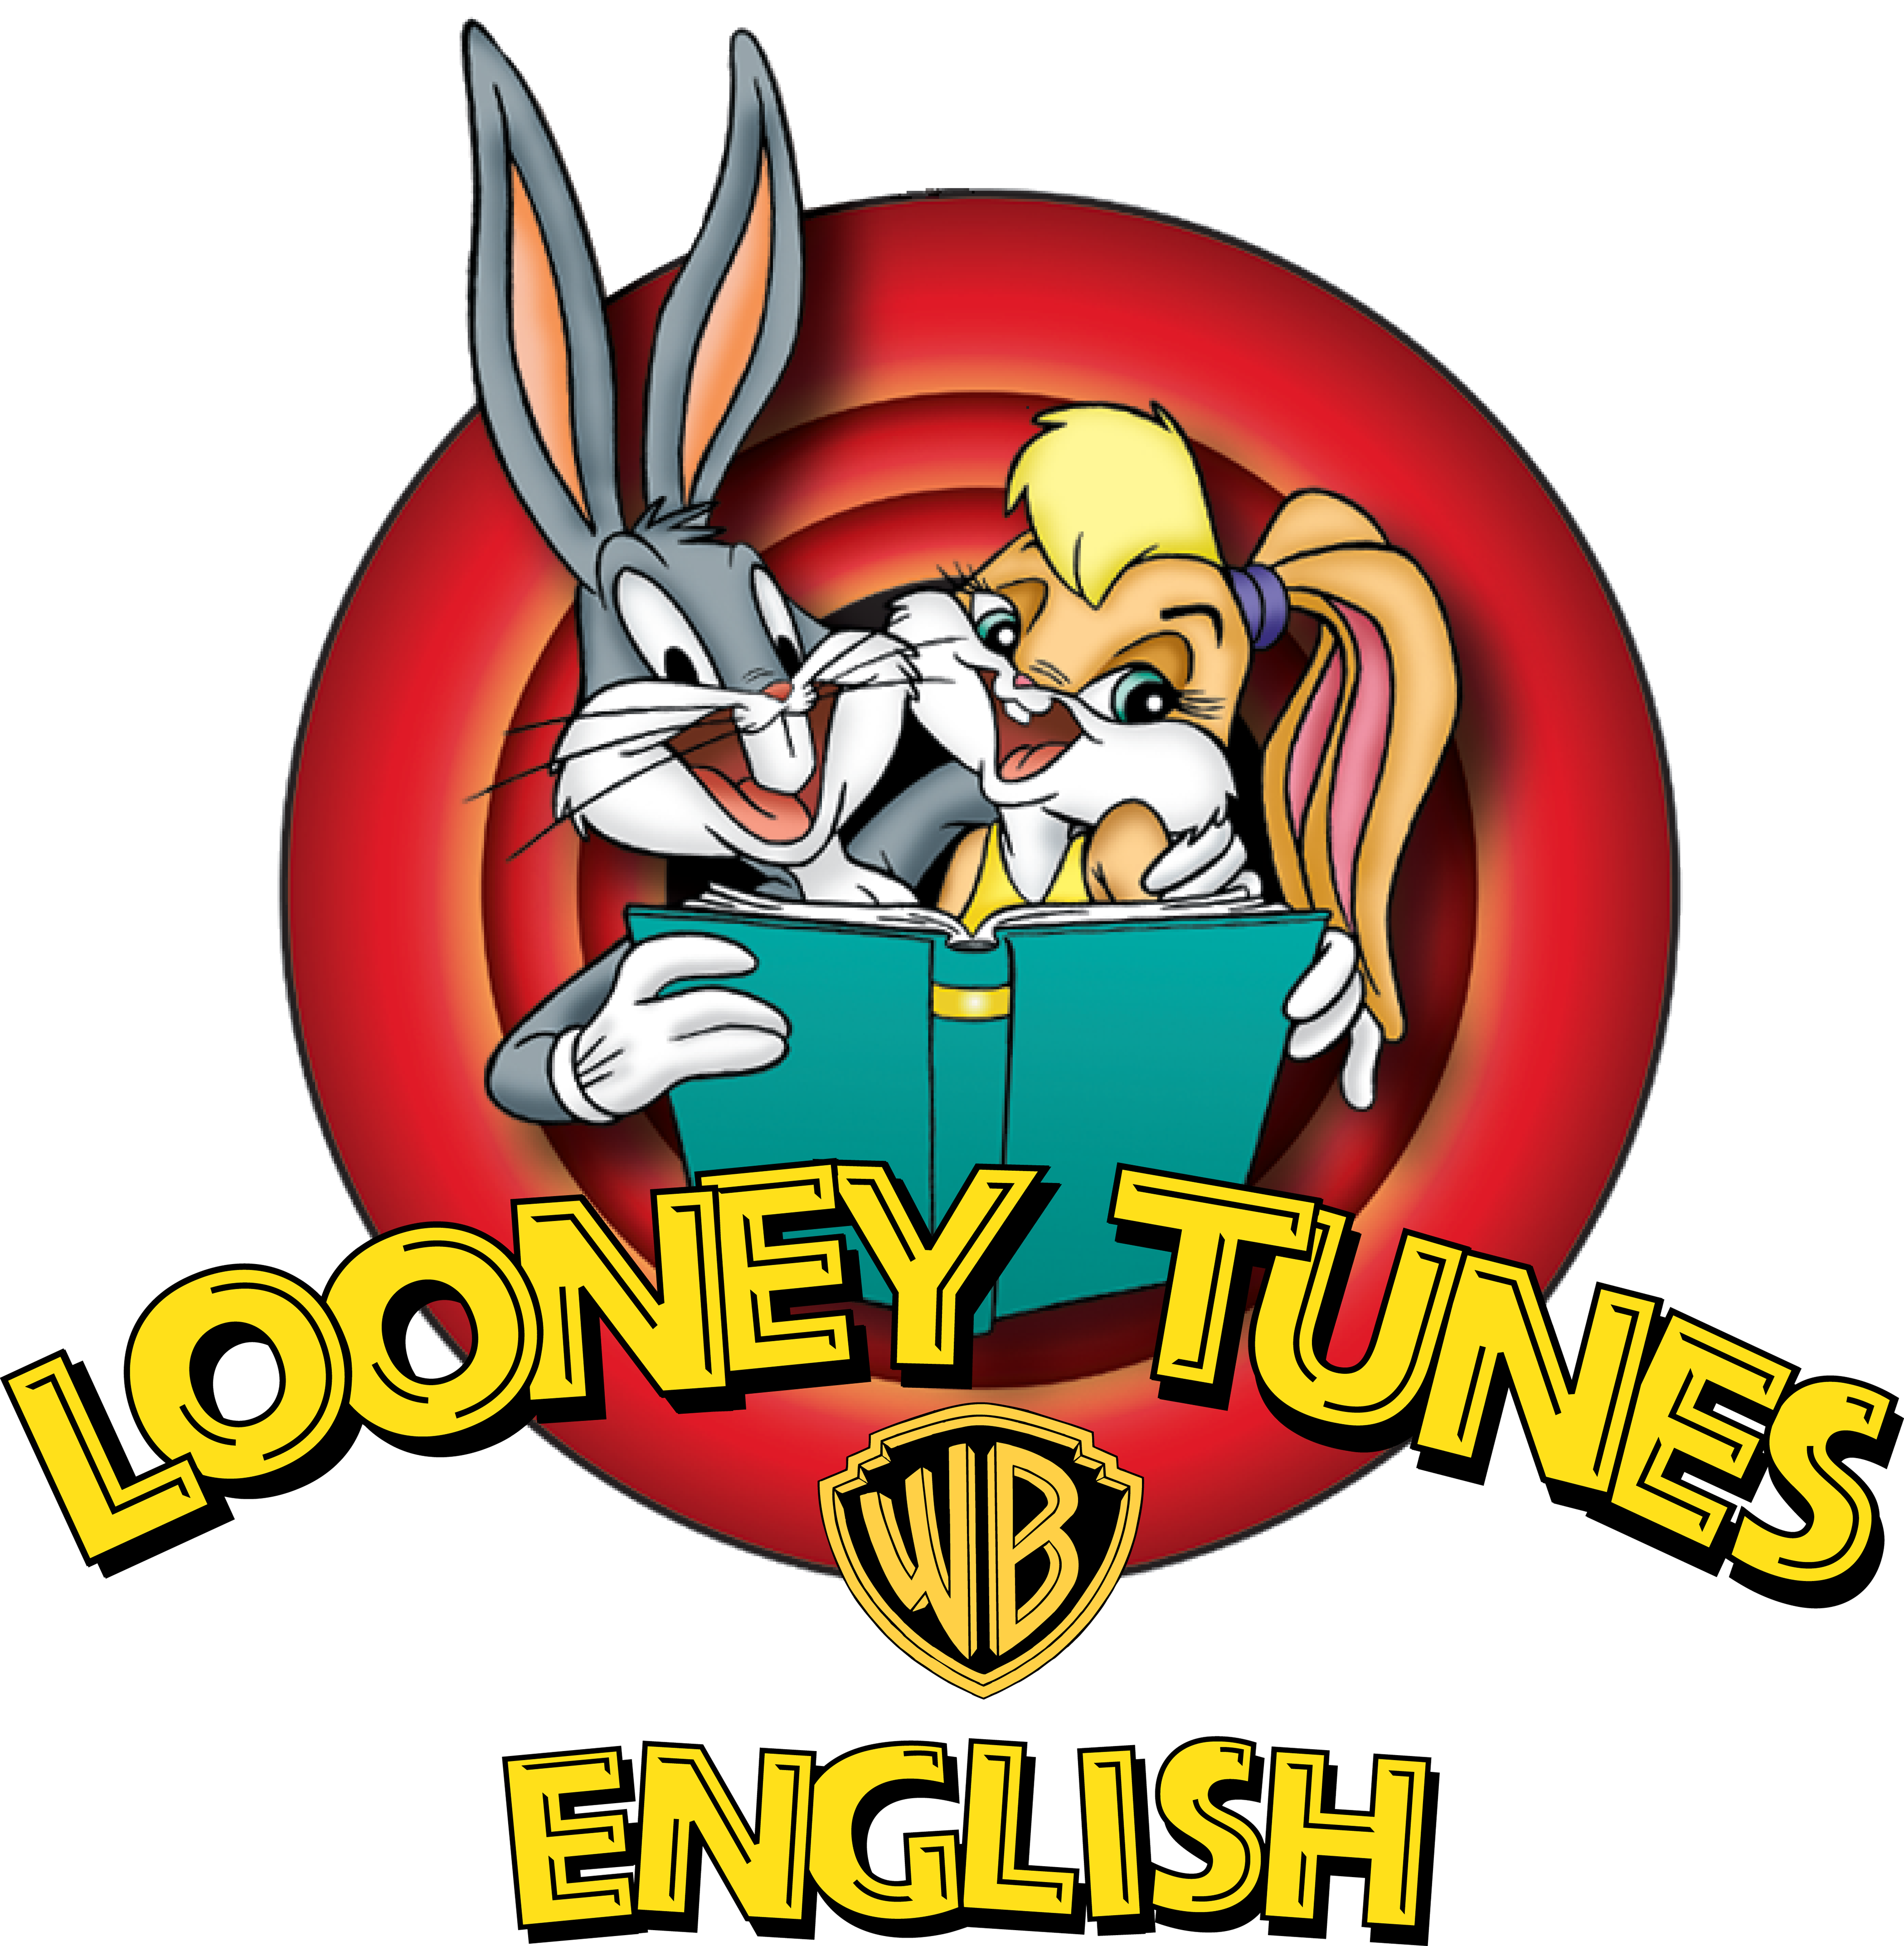 English clipart english portfolio. Demonico design looney tunes